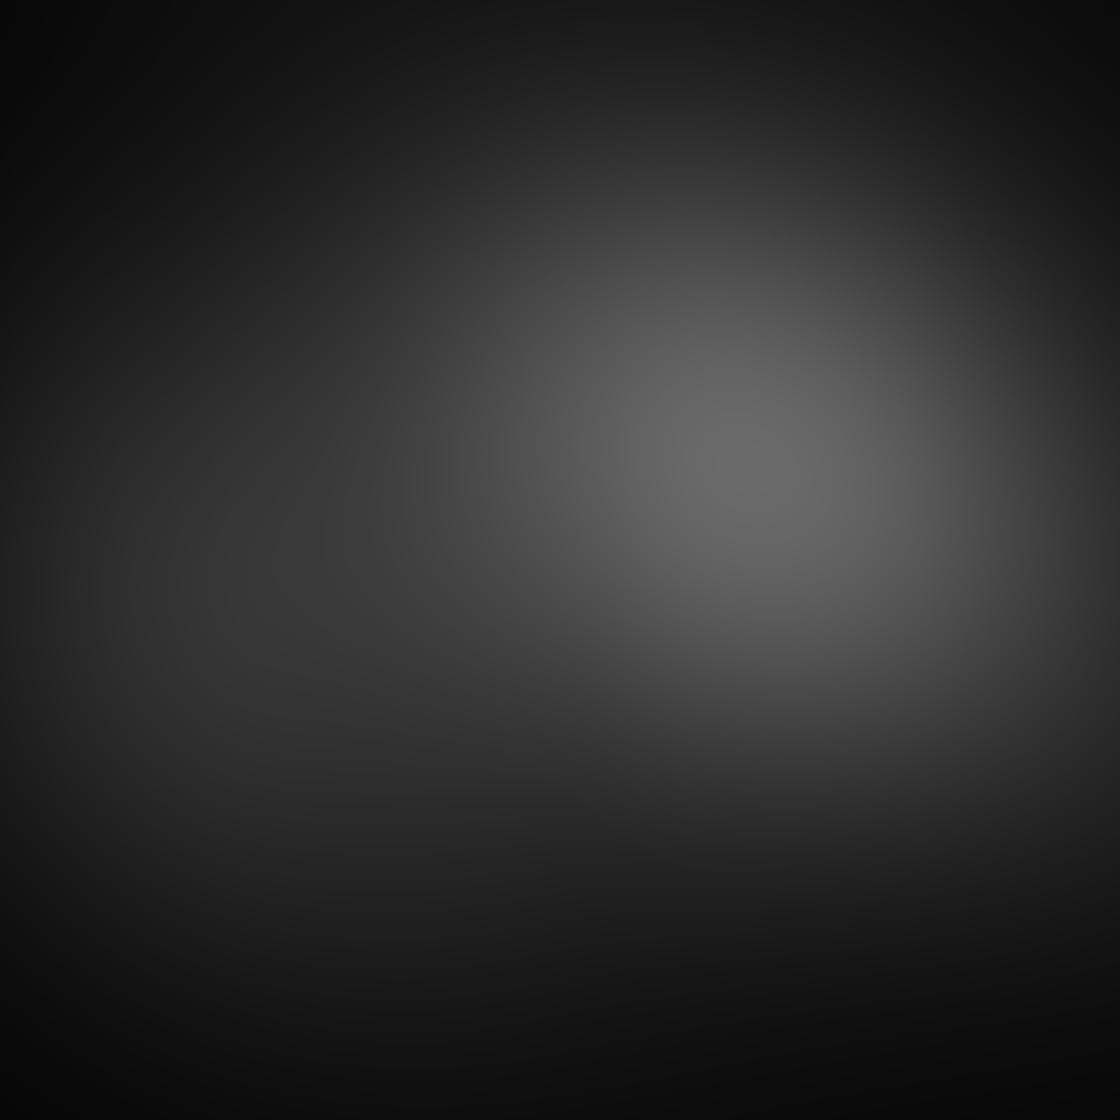 iPhone Photos Black White 9